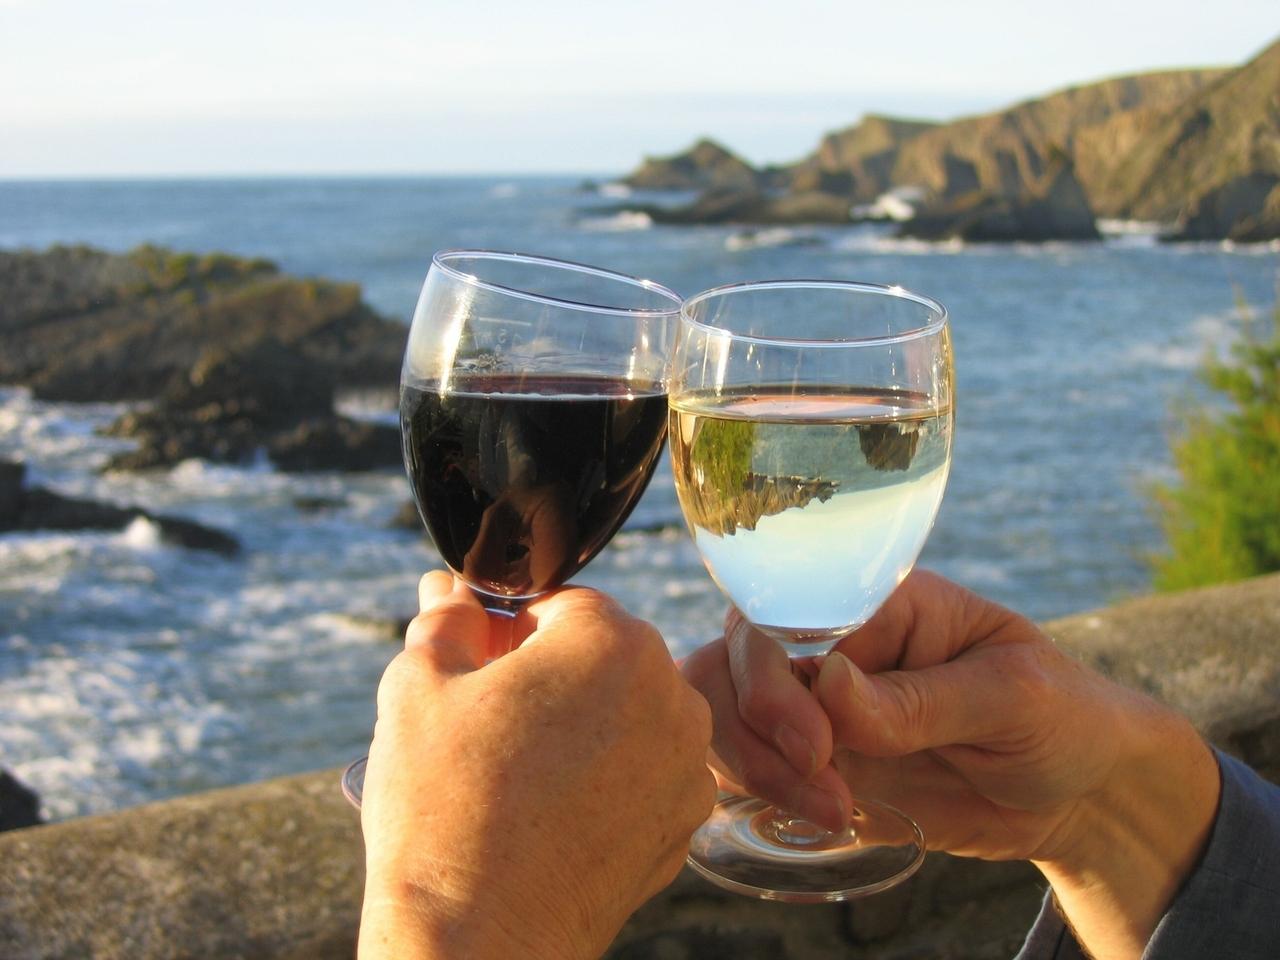 Brindar con vino, 9 razones